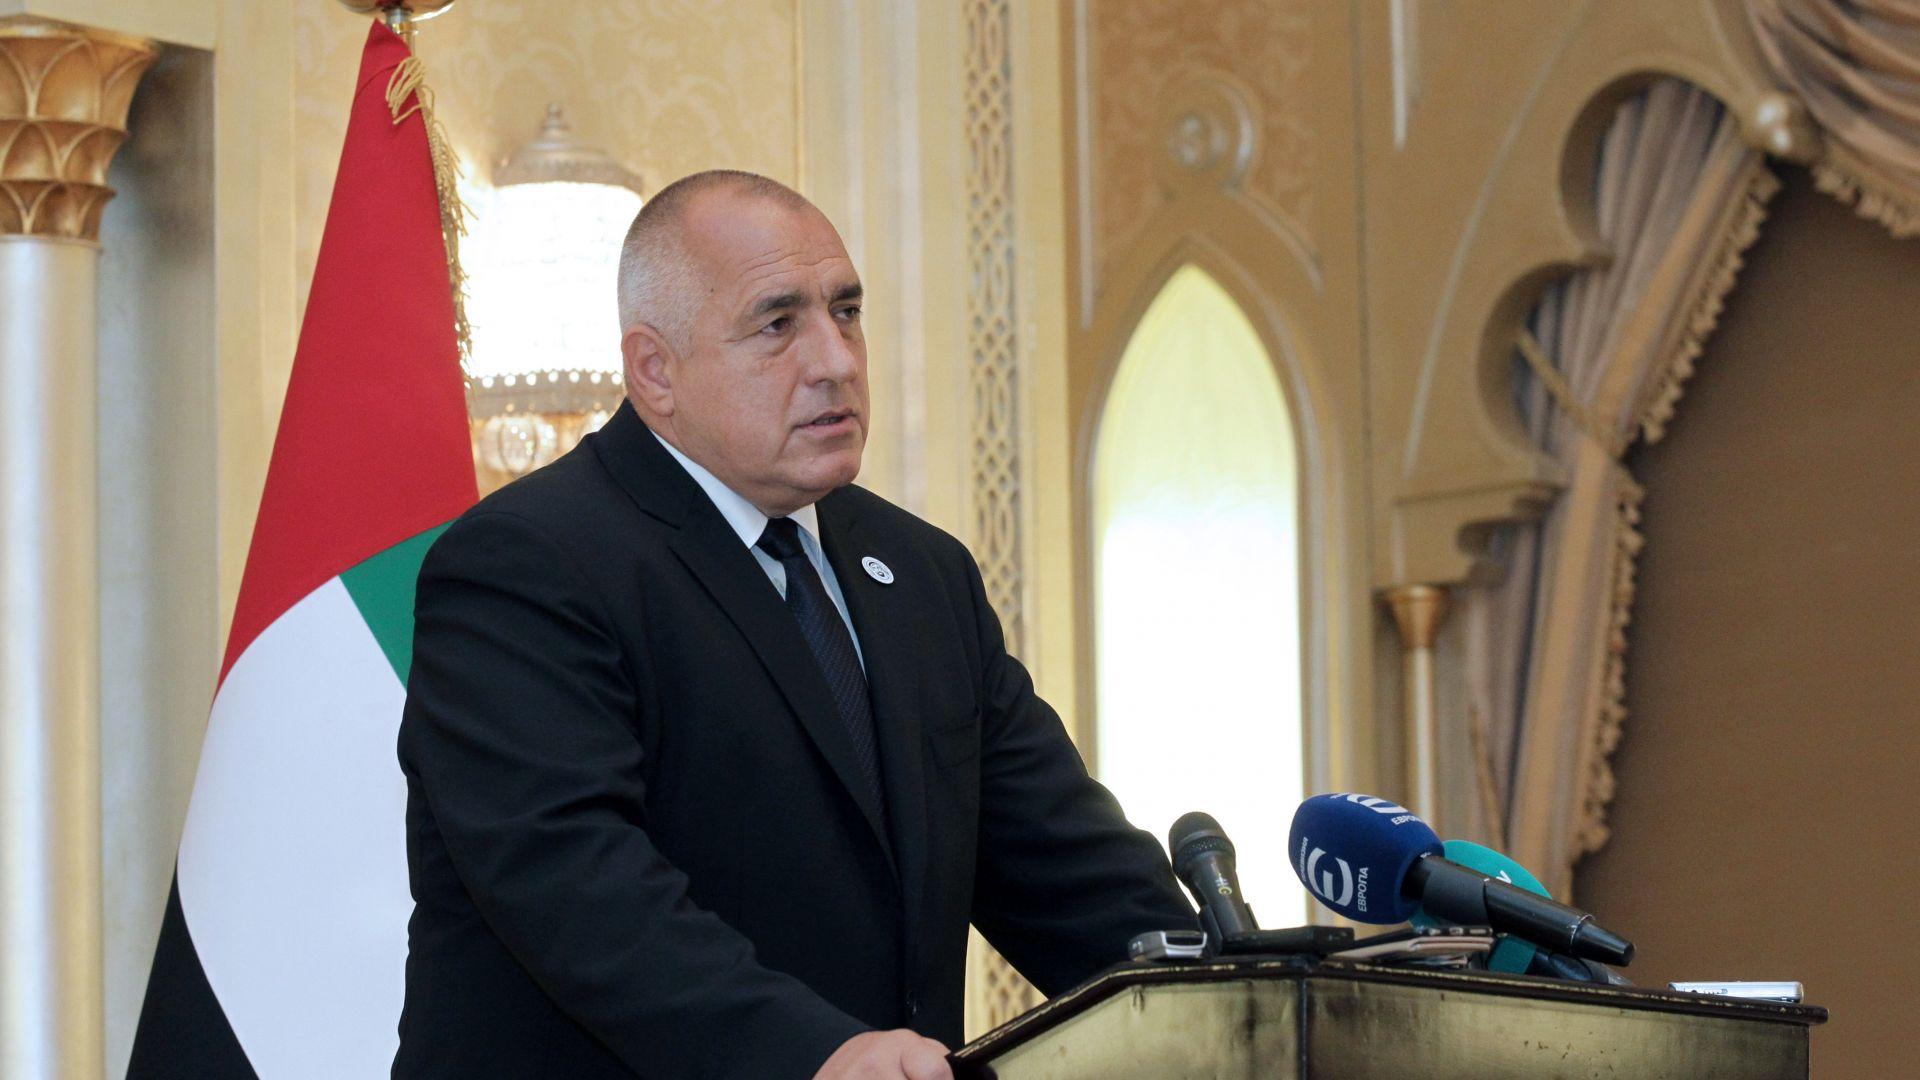 България и ОАЕ ще подпишат Стратегически договор за партньорство каза